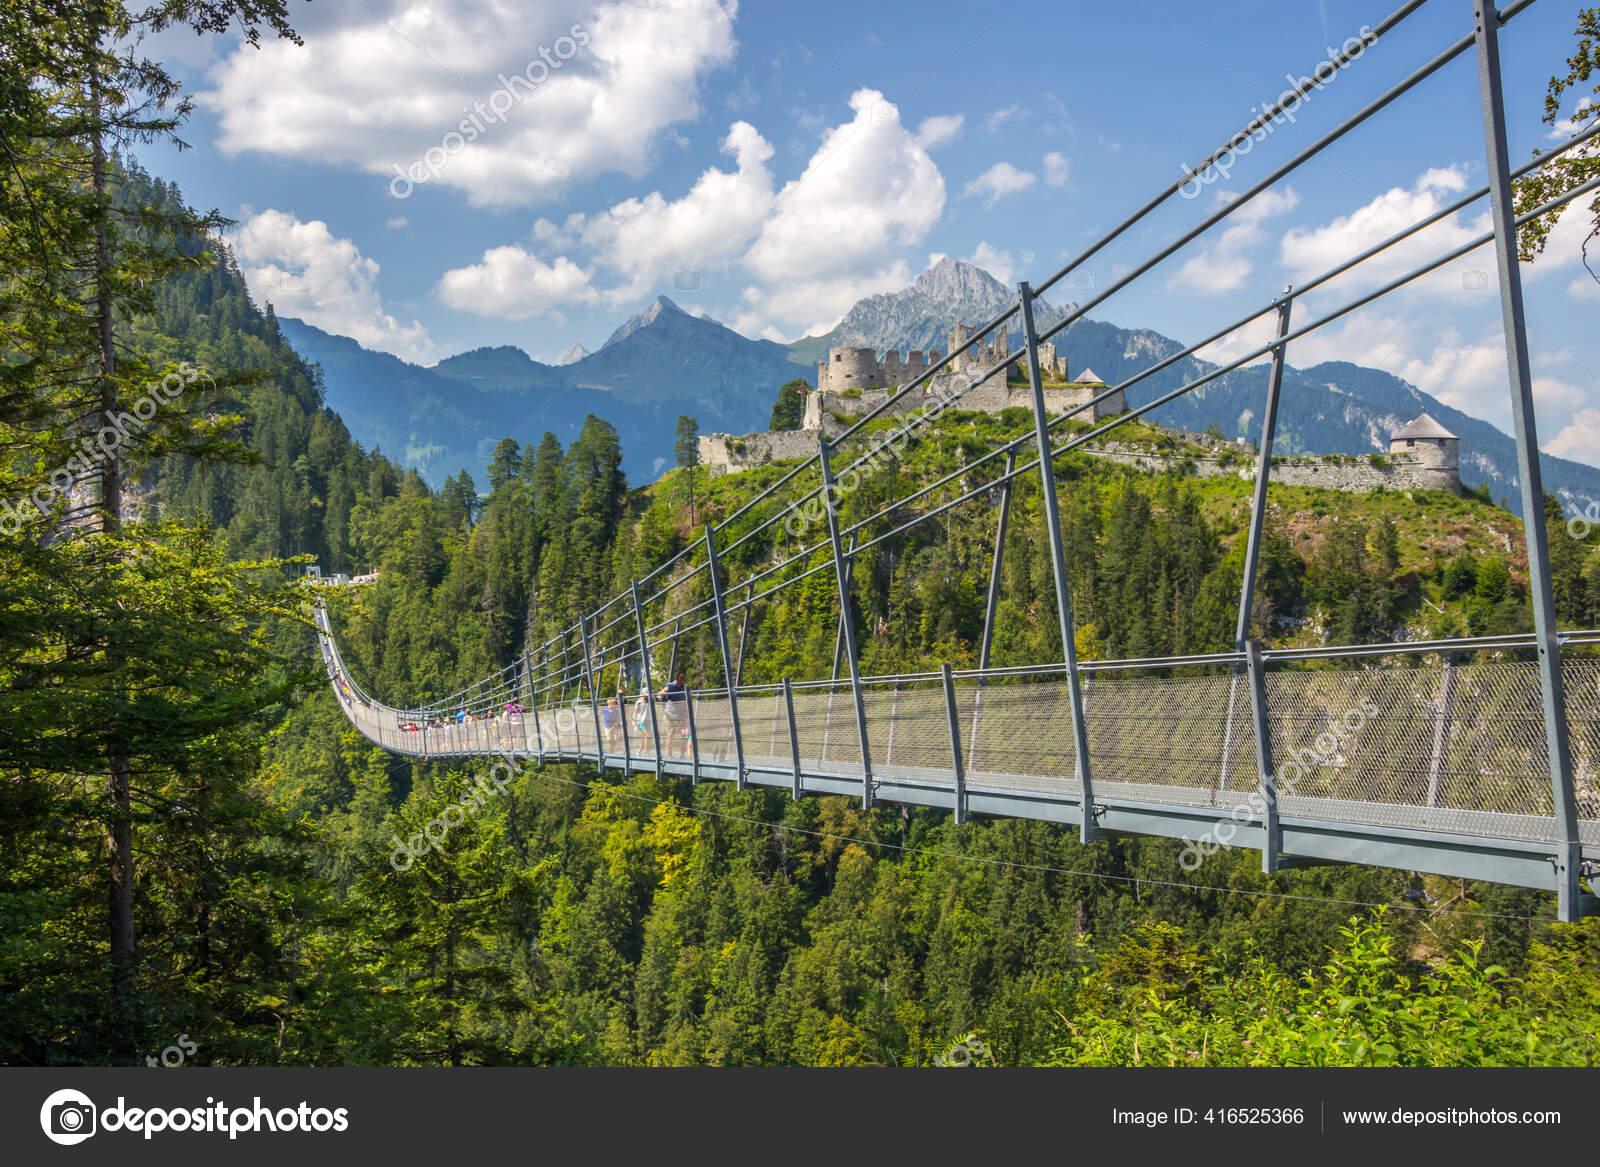 Highlin 20 Suspension Bridge Sunny Day Austrian Alps Stock Photo ...